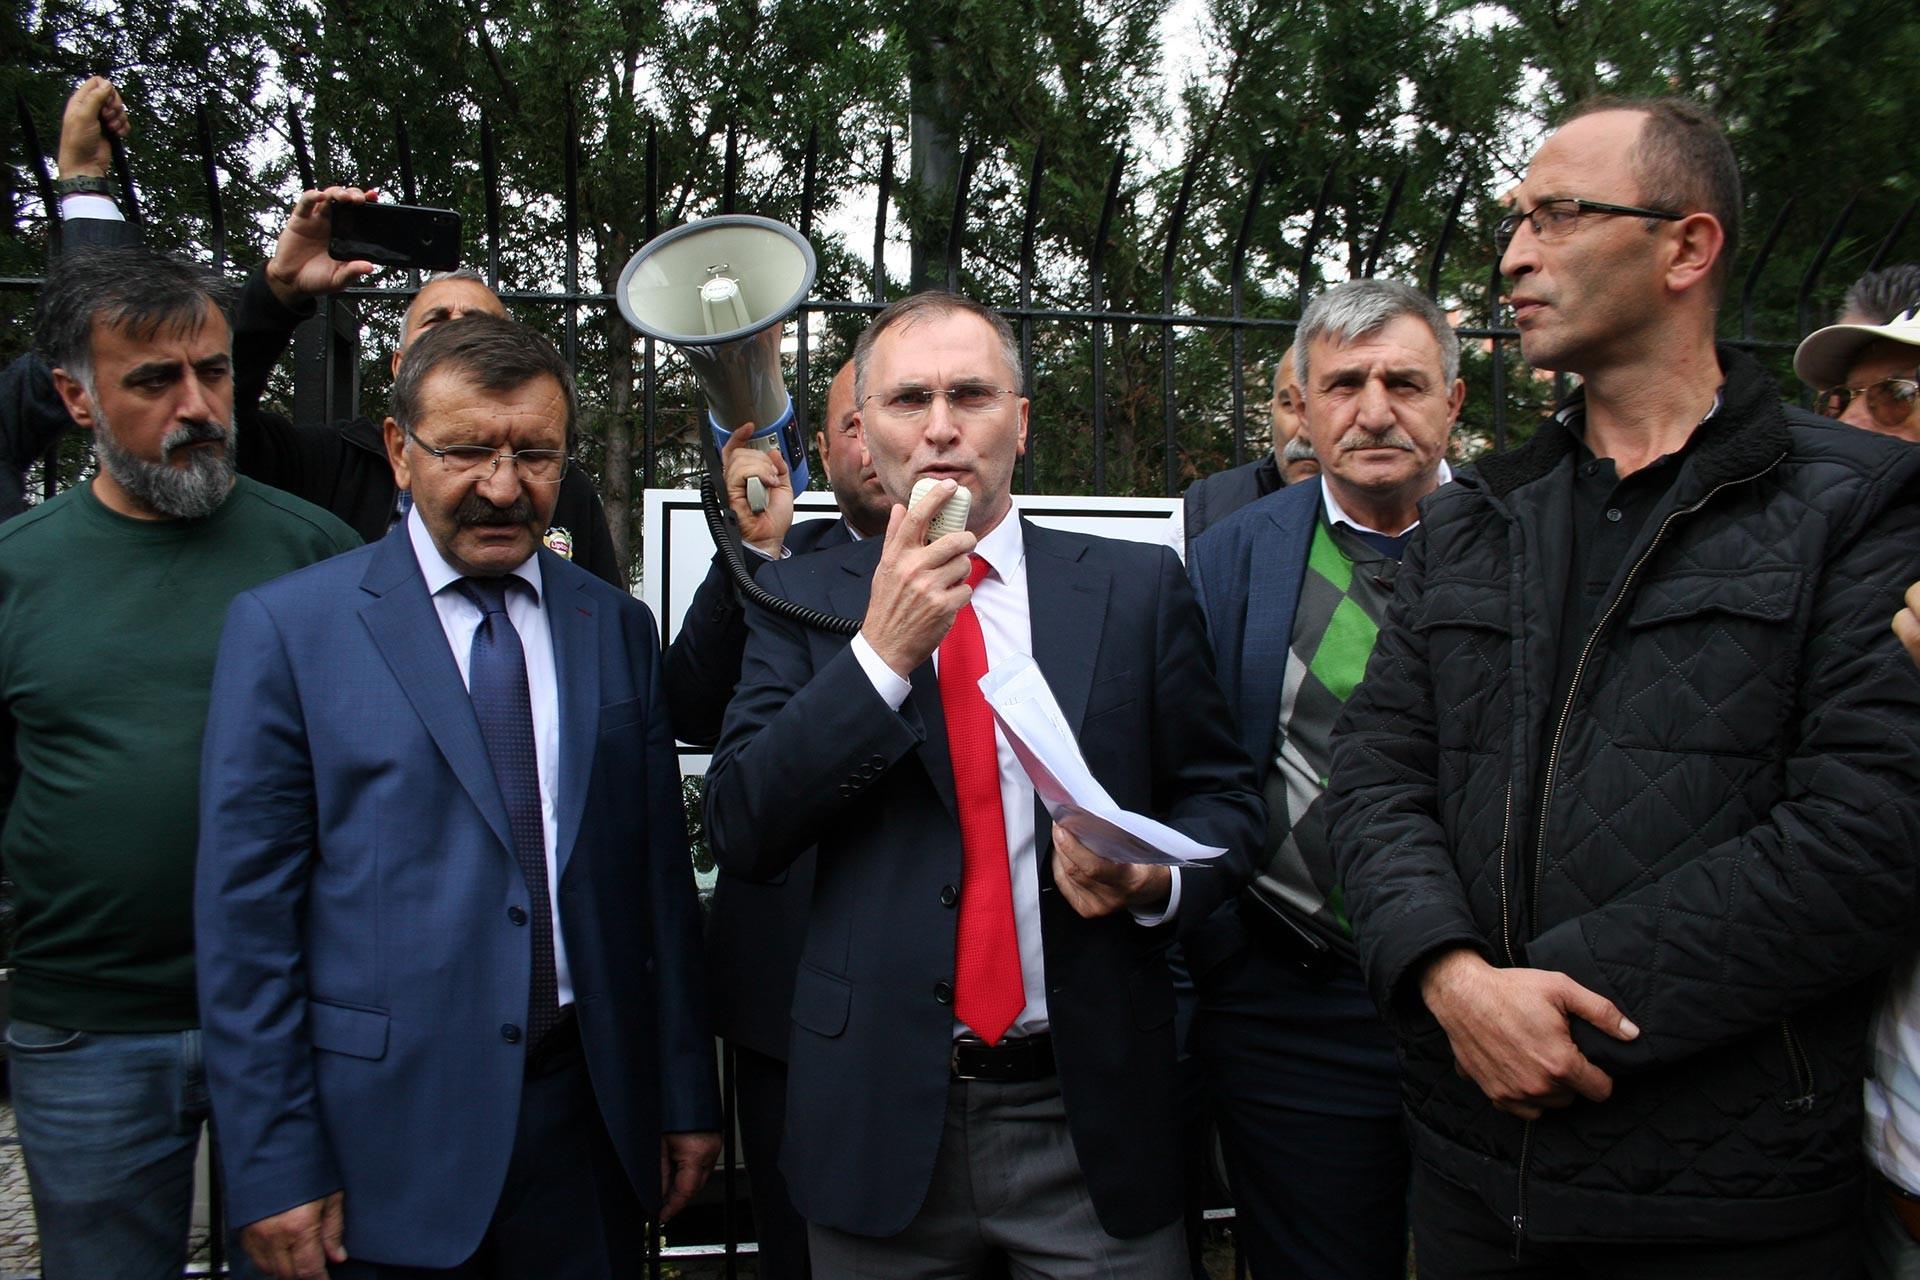 İddaa bayileri, komisyonlarının düşürülmesini protesto etti